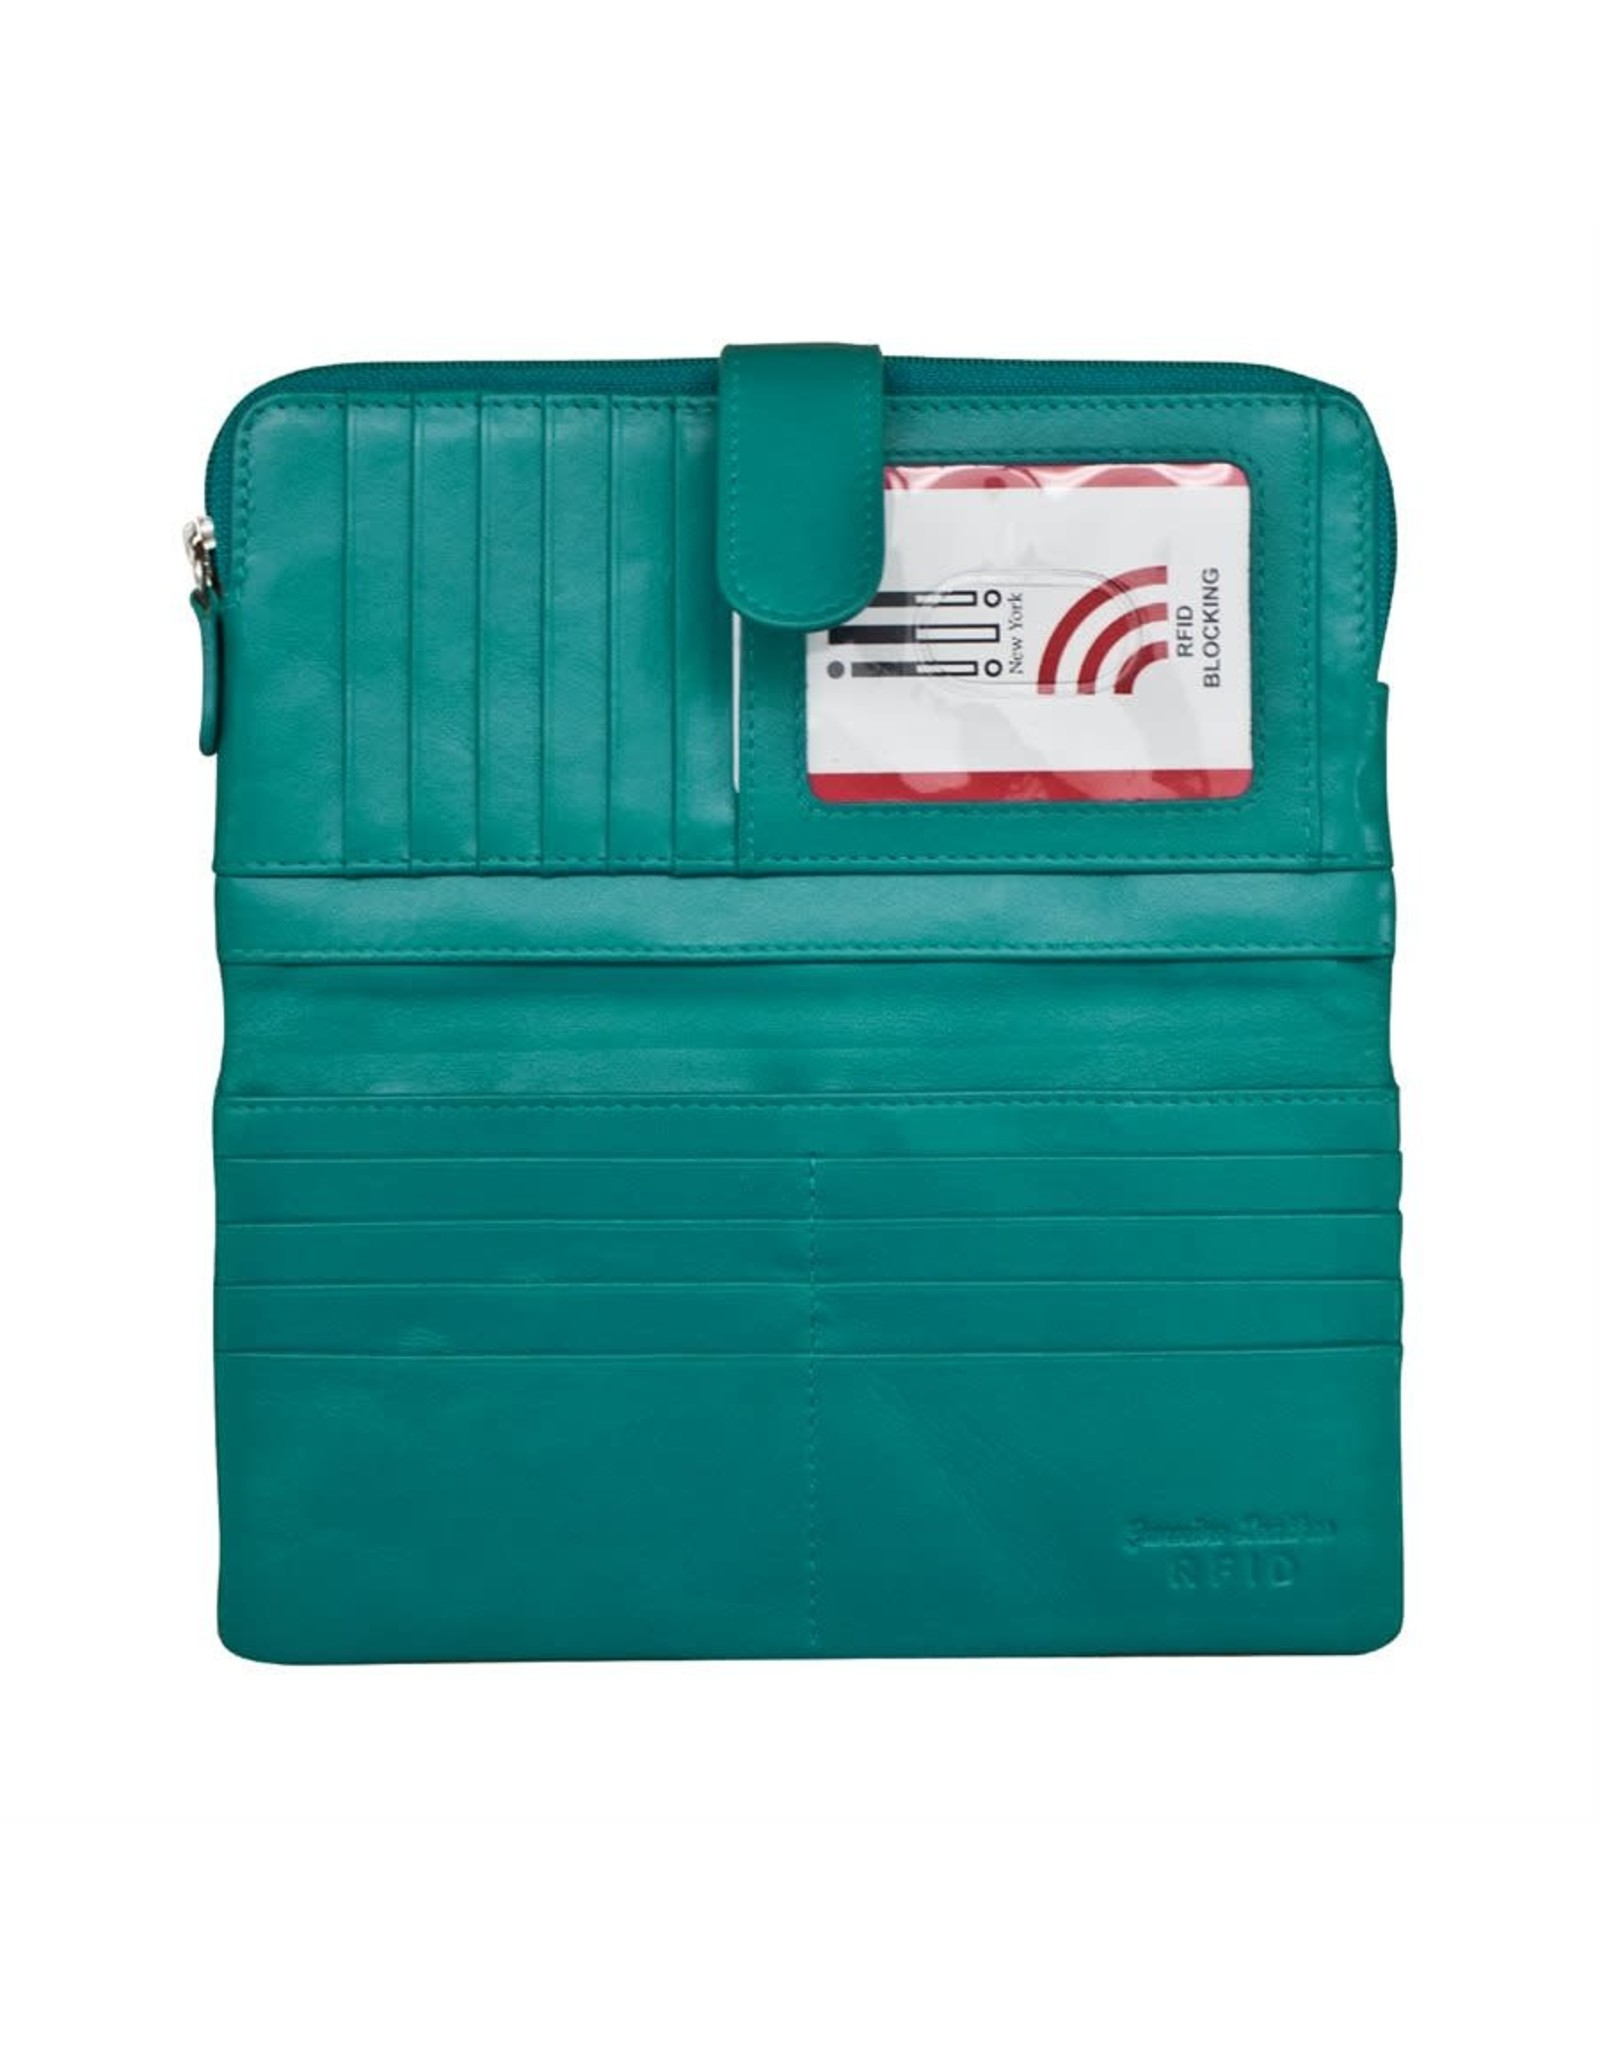 Leather Handbags and Accessories 7420 Aqua - RFID Smartphone Wallet